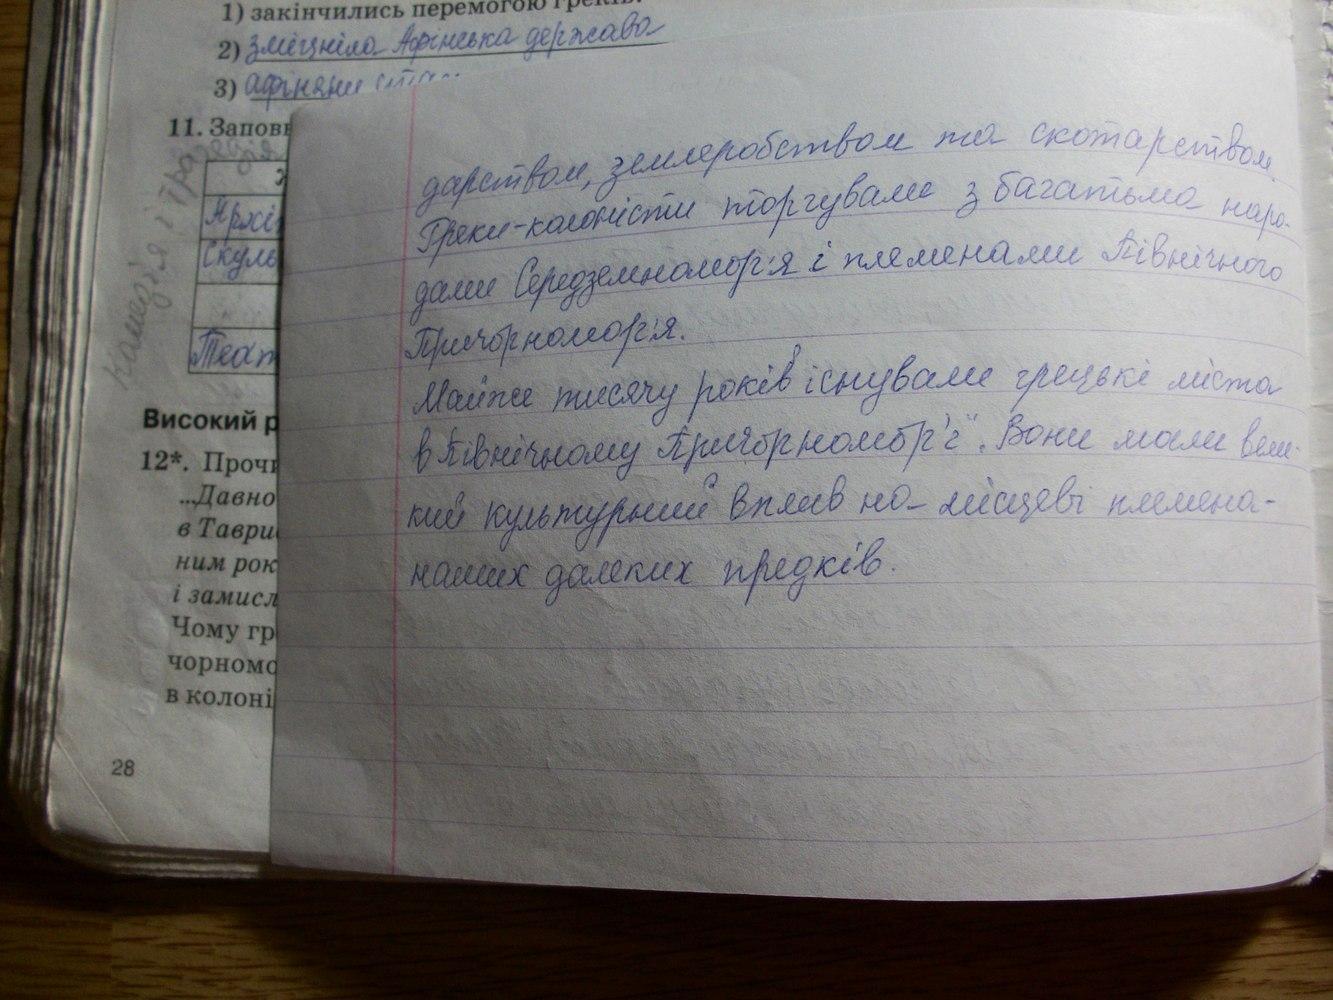 ГДЗ рабочие тетради 6 класс. Задание: стр. 28 (3)